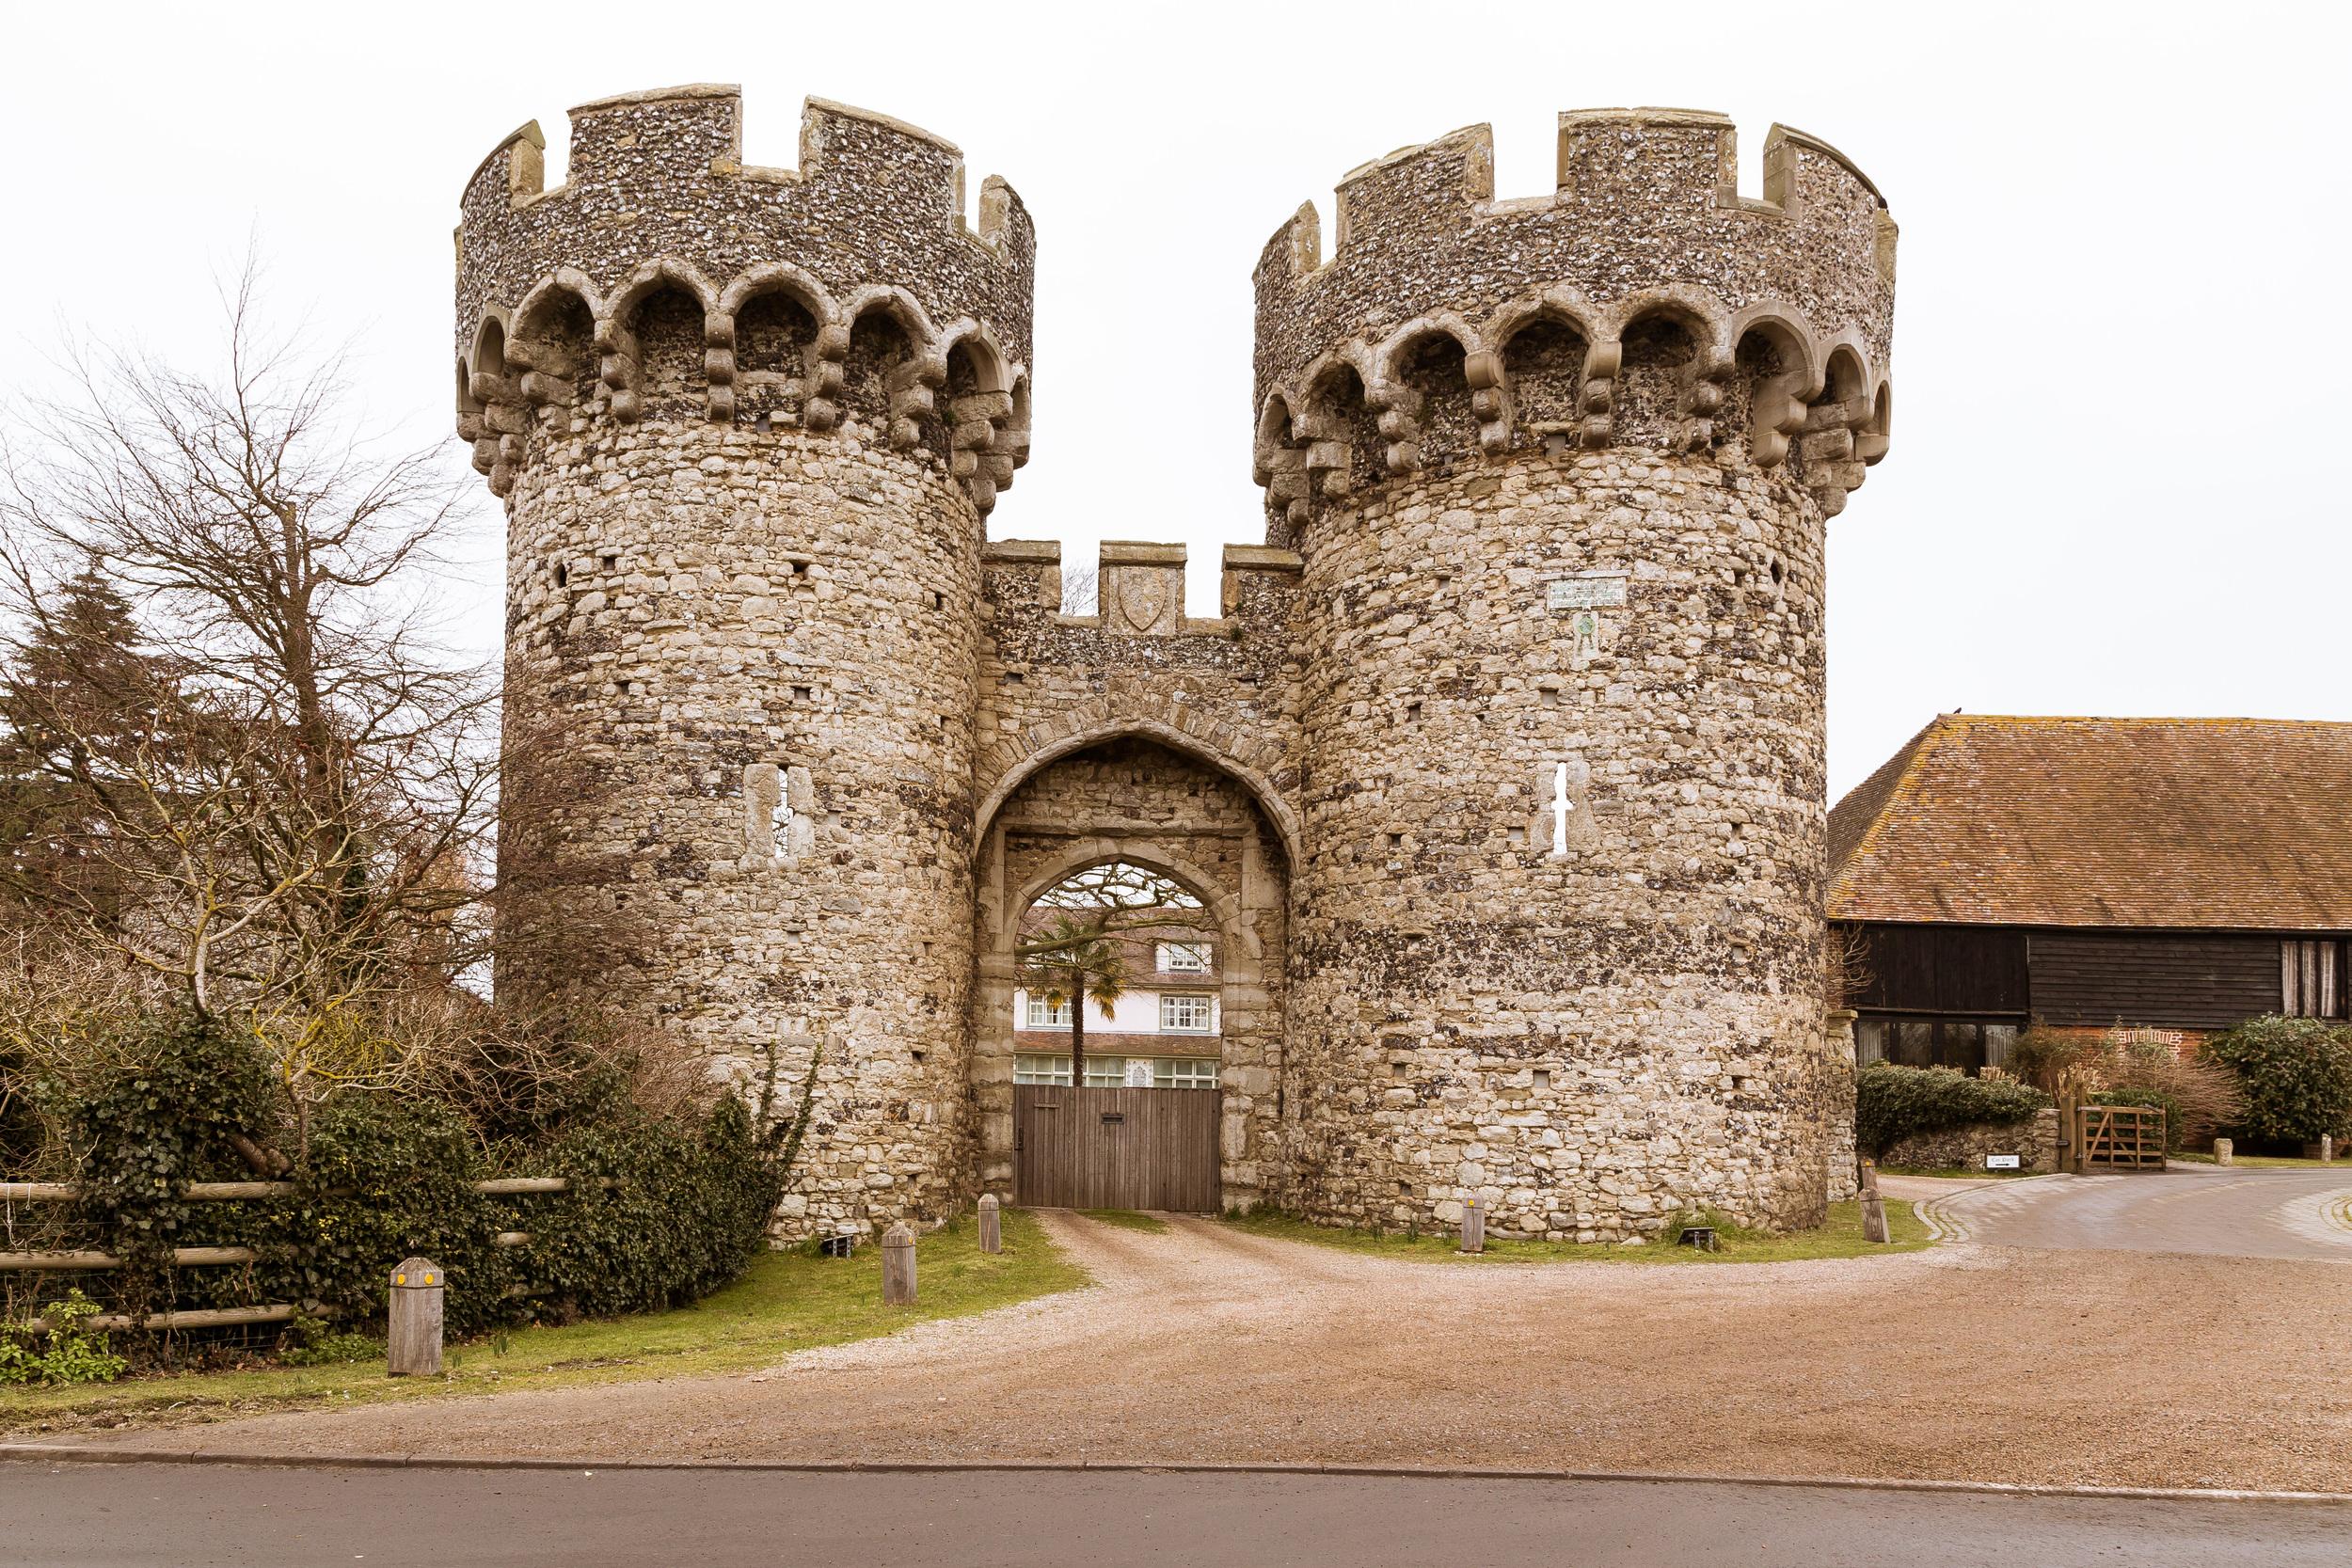 Rob & Nicola - Cooling Castle Barn - Kent - Wedding - Photographer - Edward Solly - Outside1